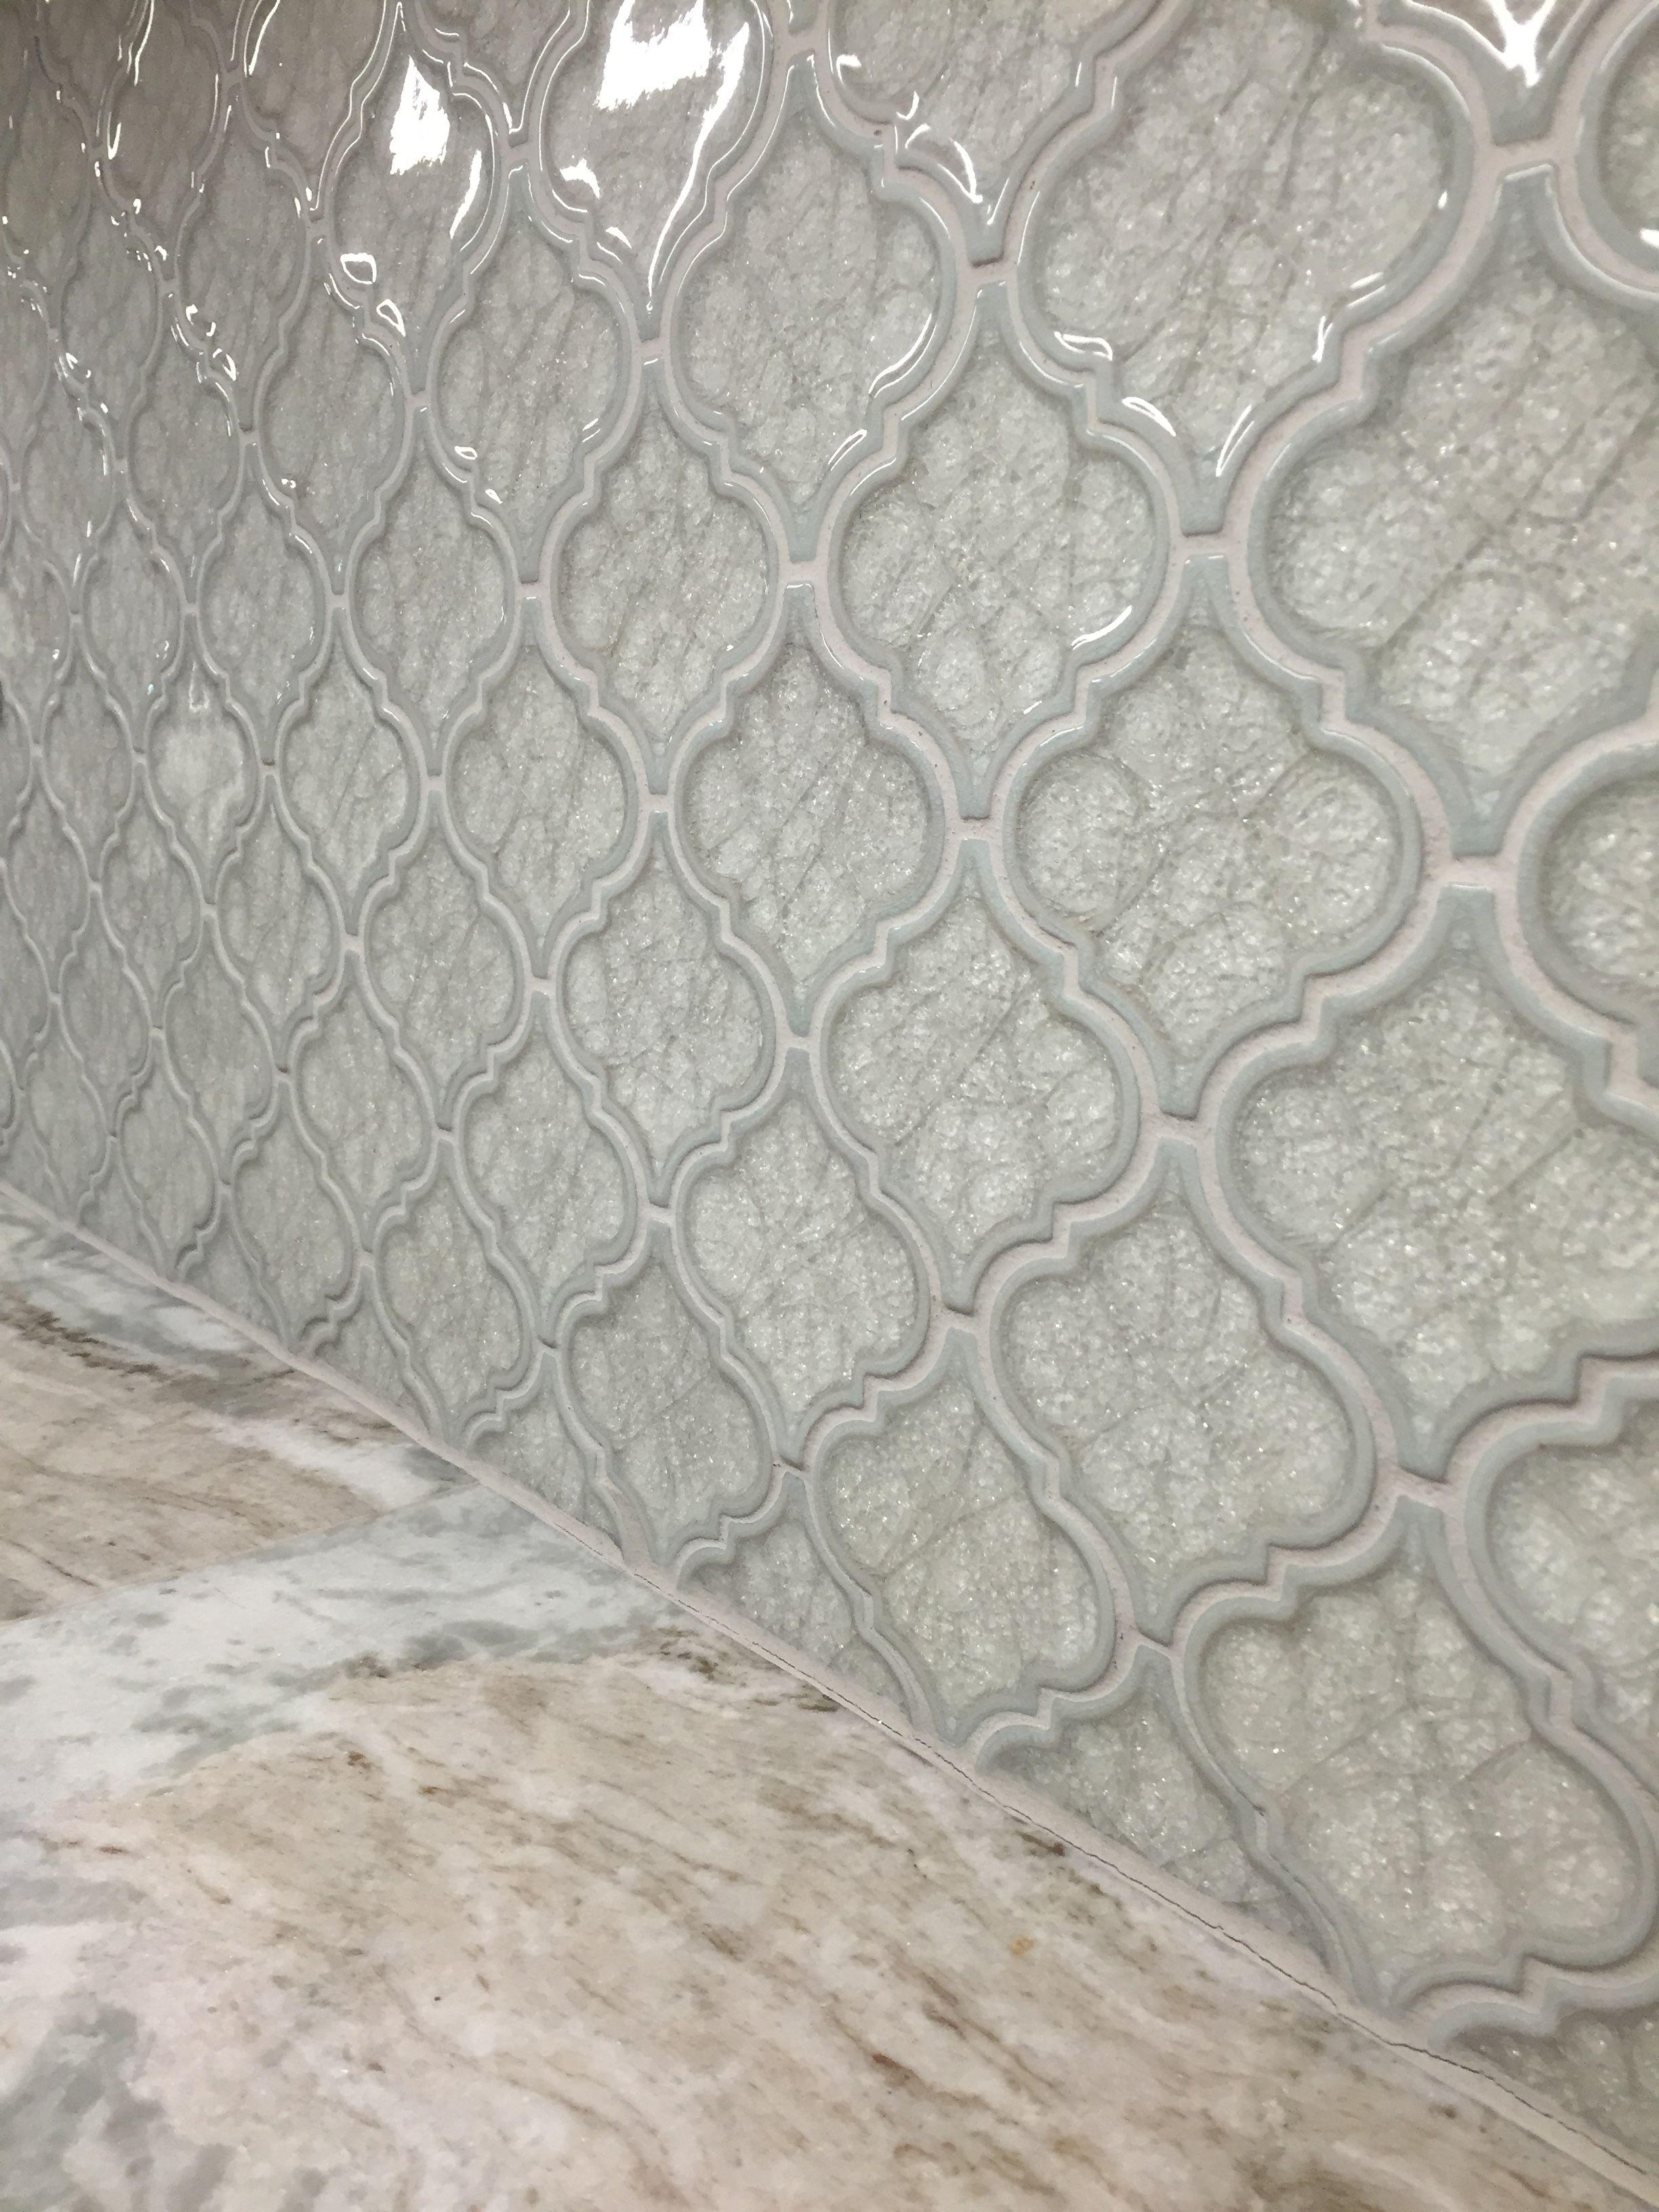 - Crackled Glass Arabesque Tile With Fantasy Brown Quartzite